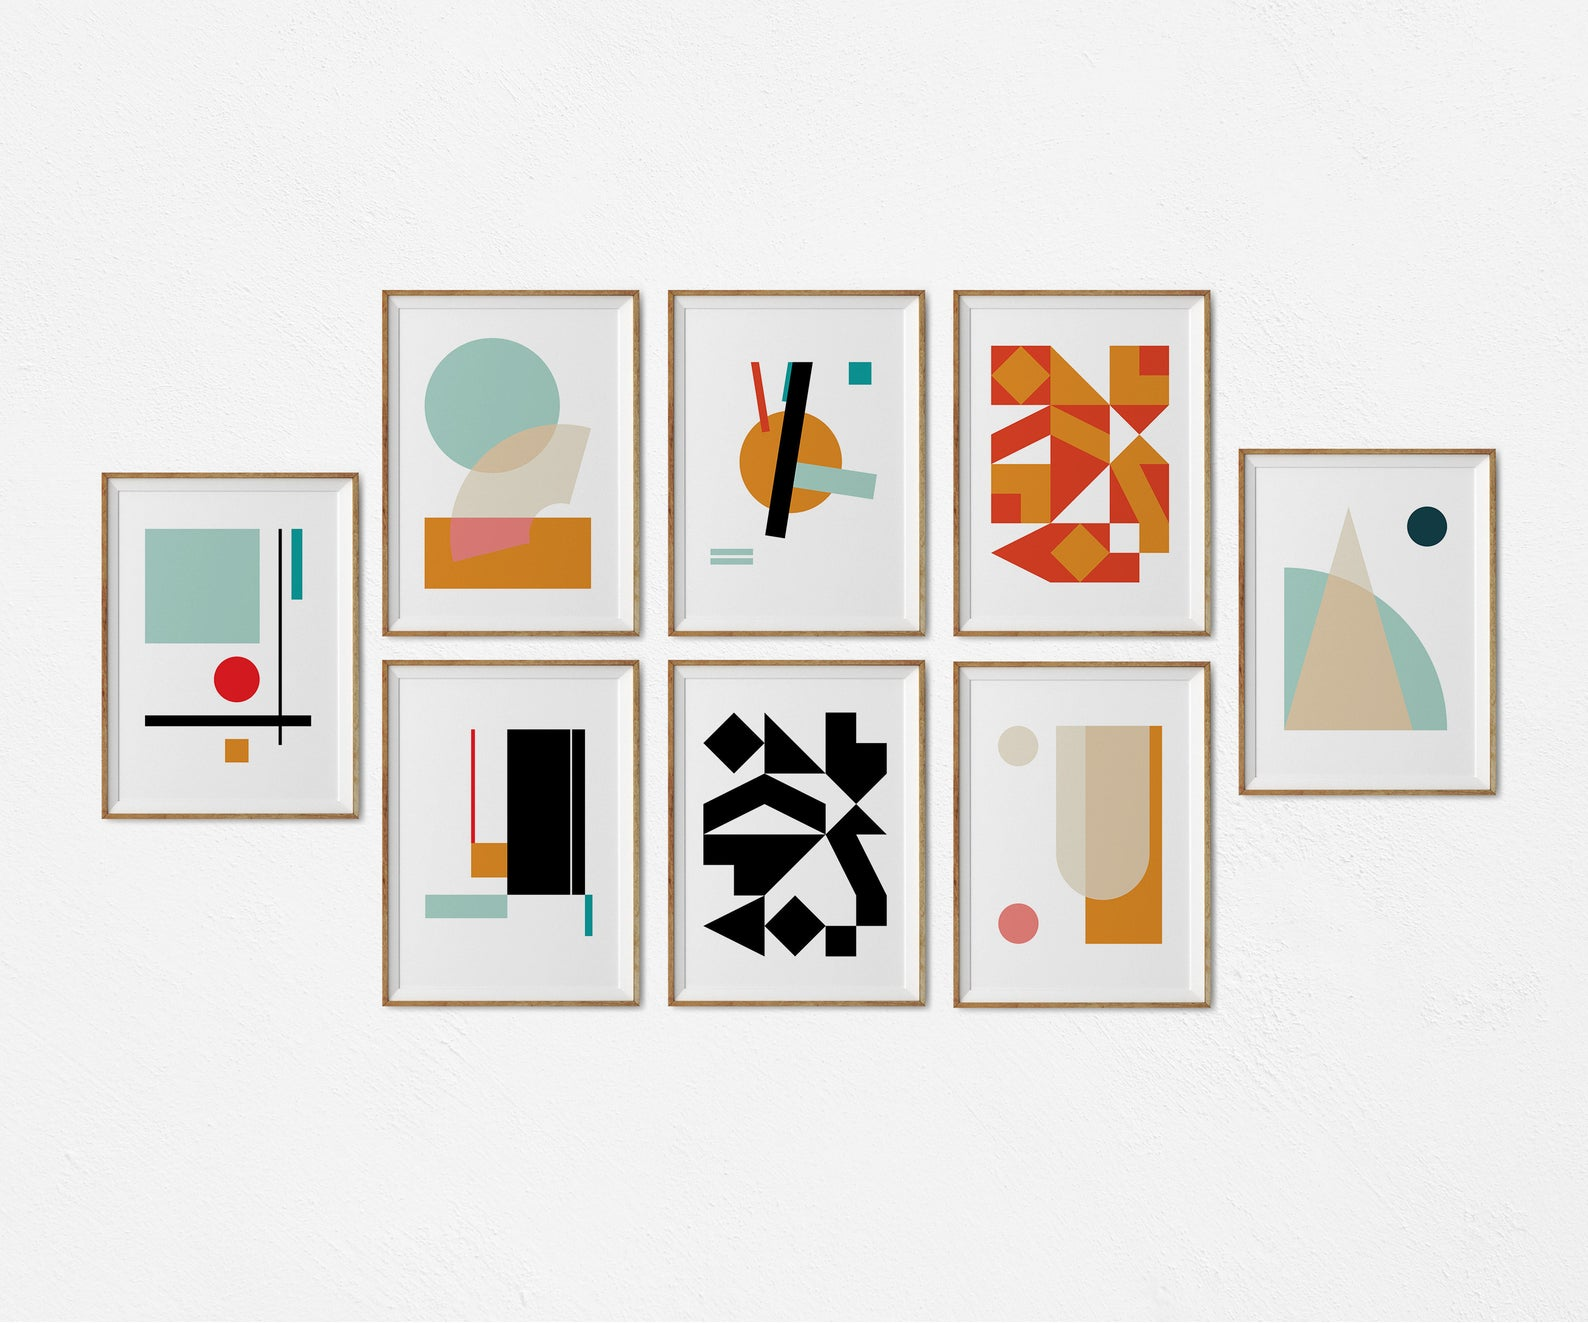 Mondrian style sheets